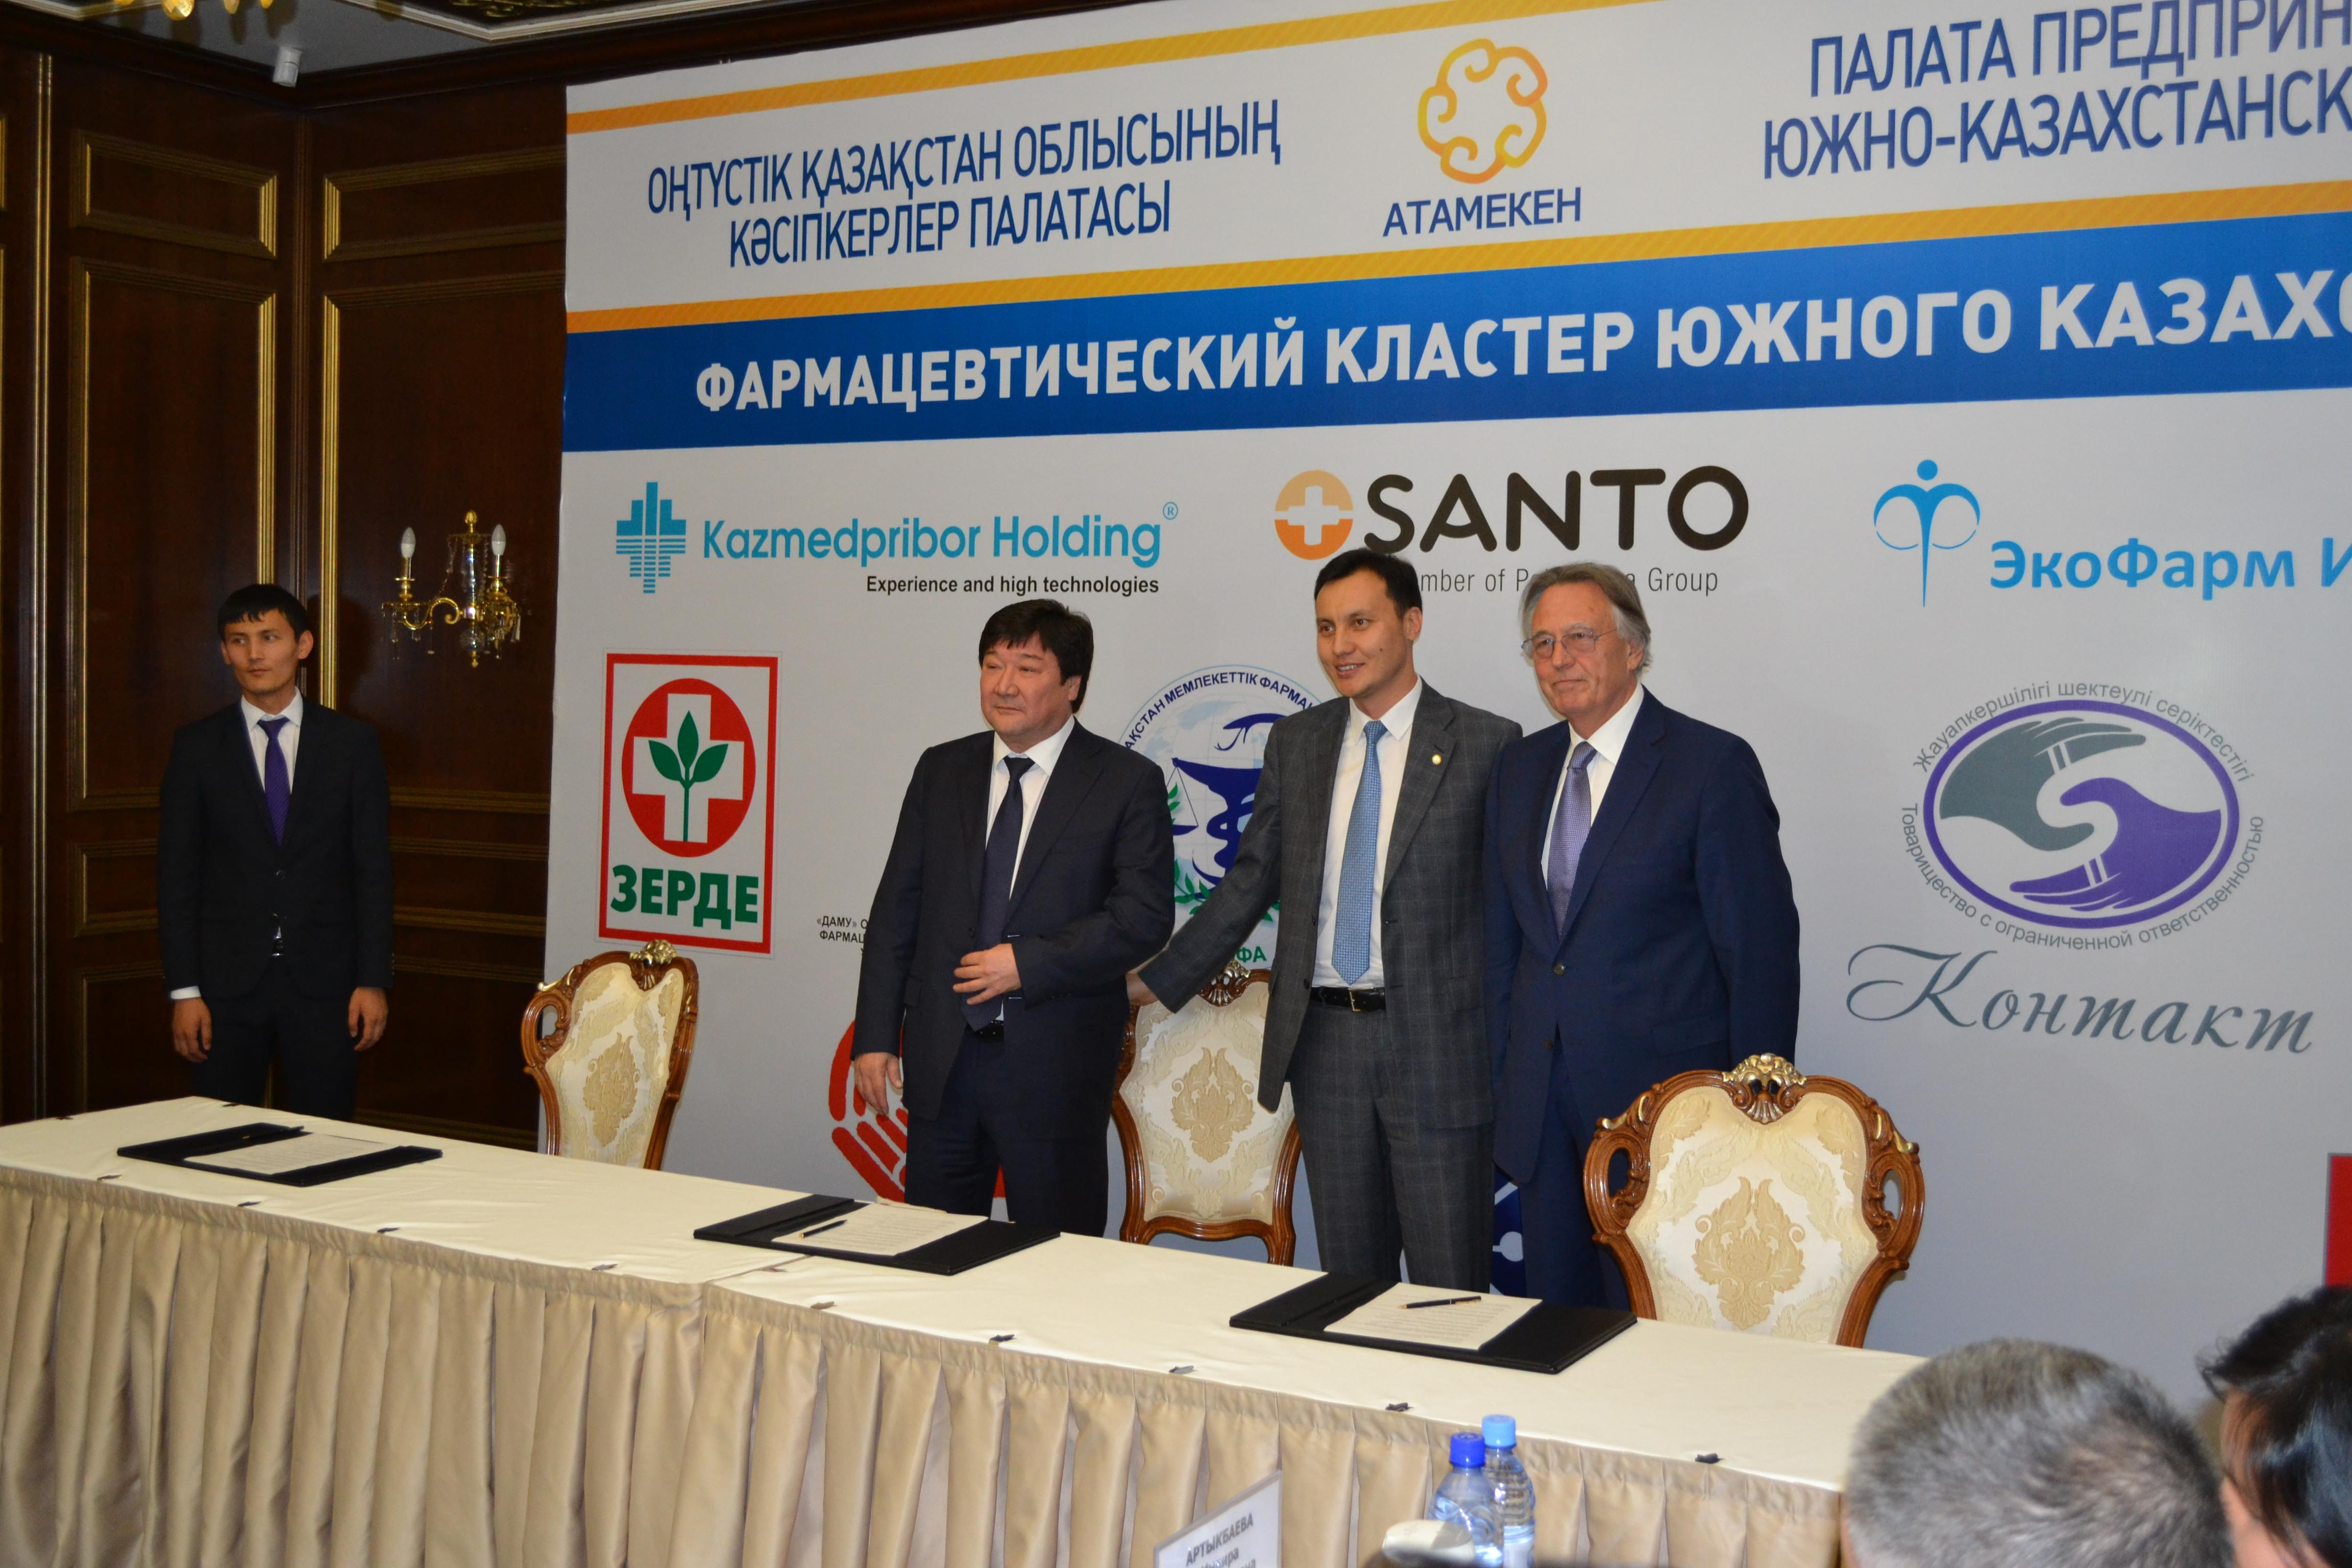 Бахытжан сексенбаев ректор фармацевтической академии юко